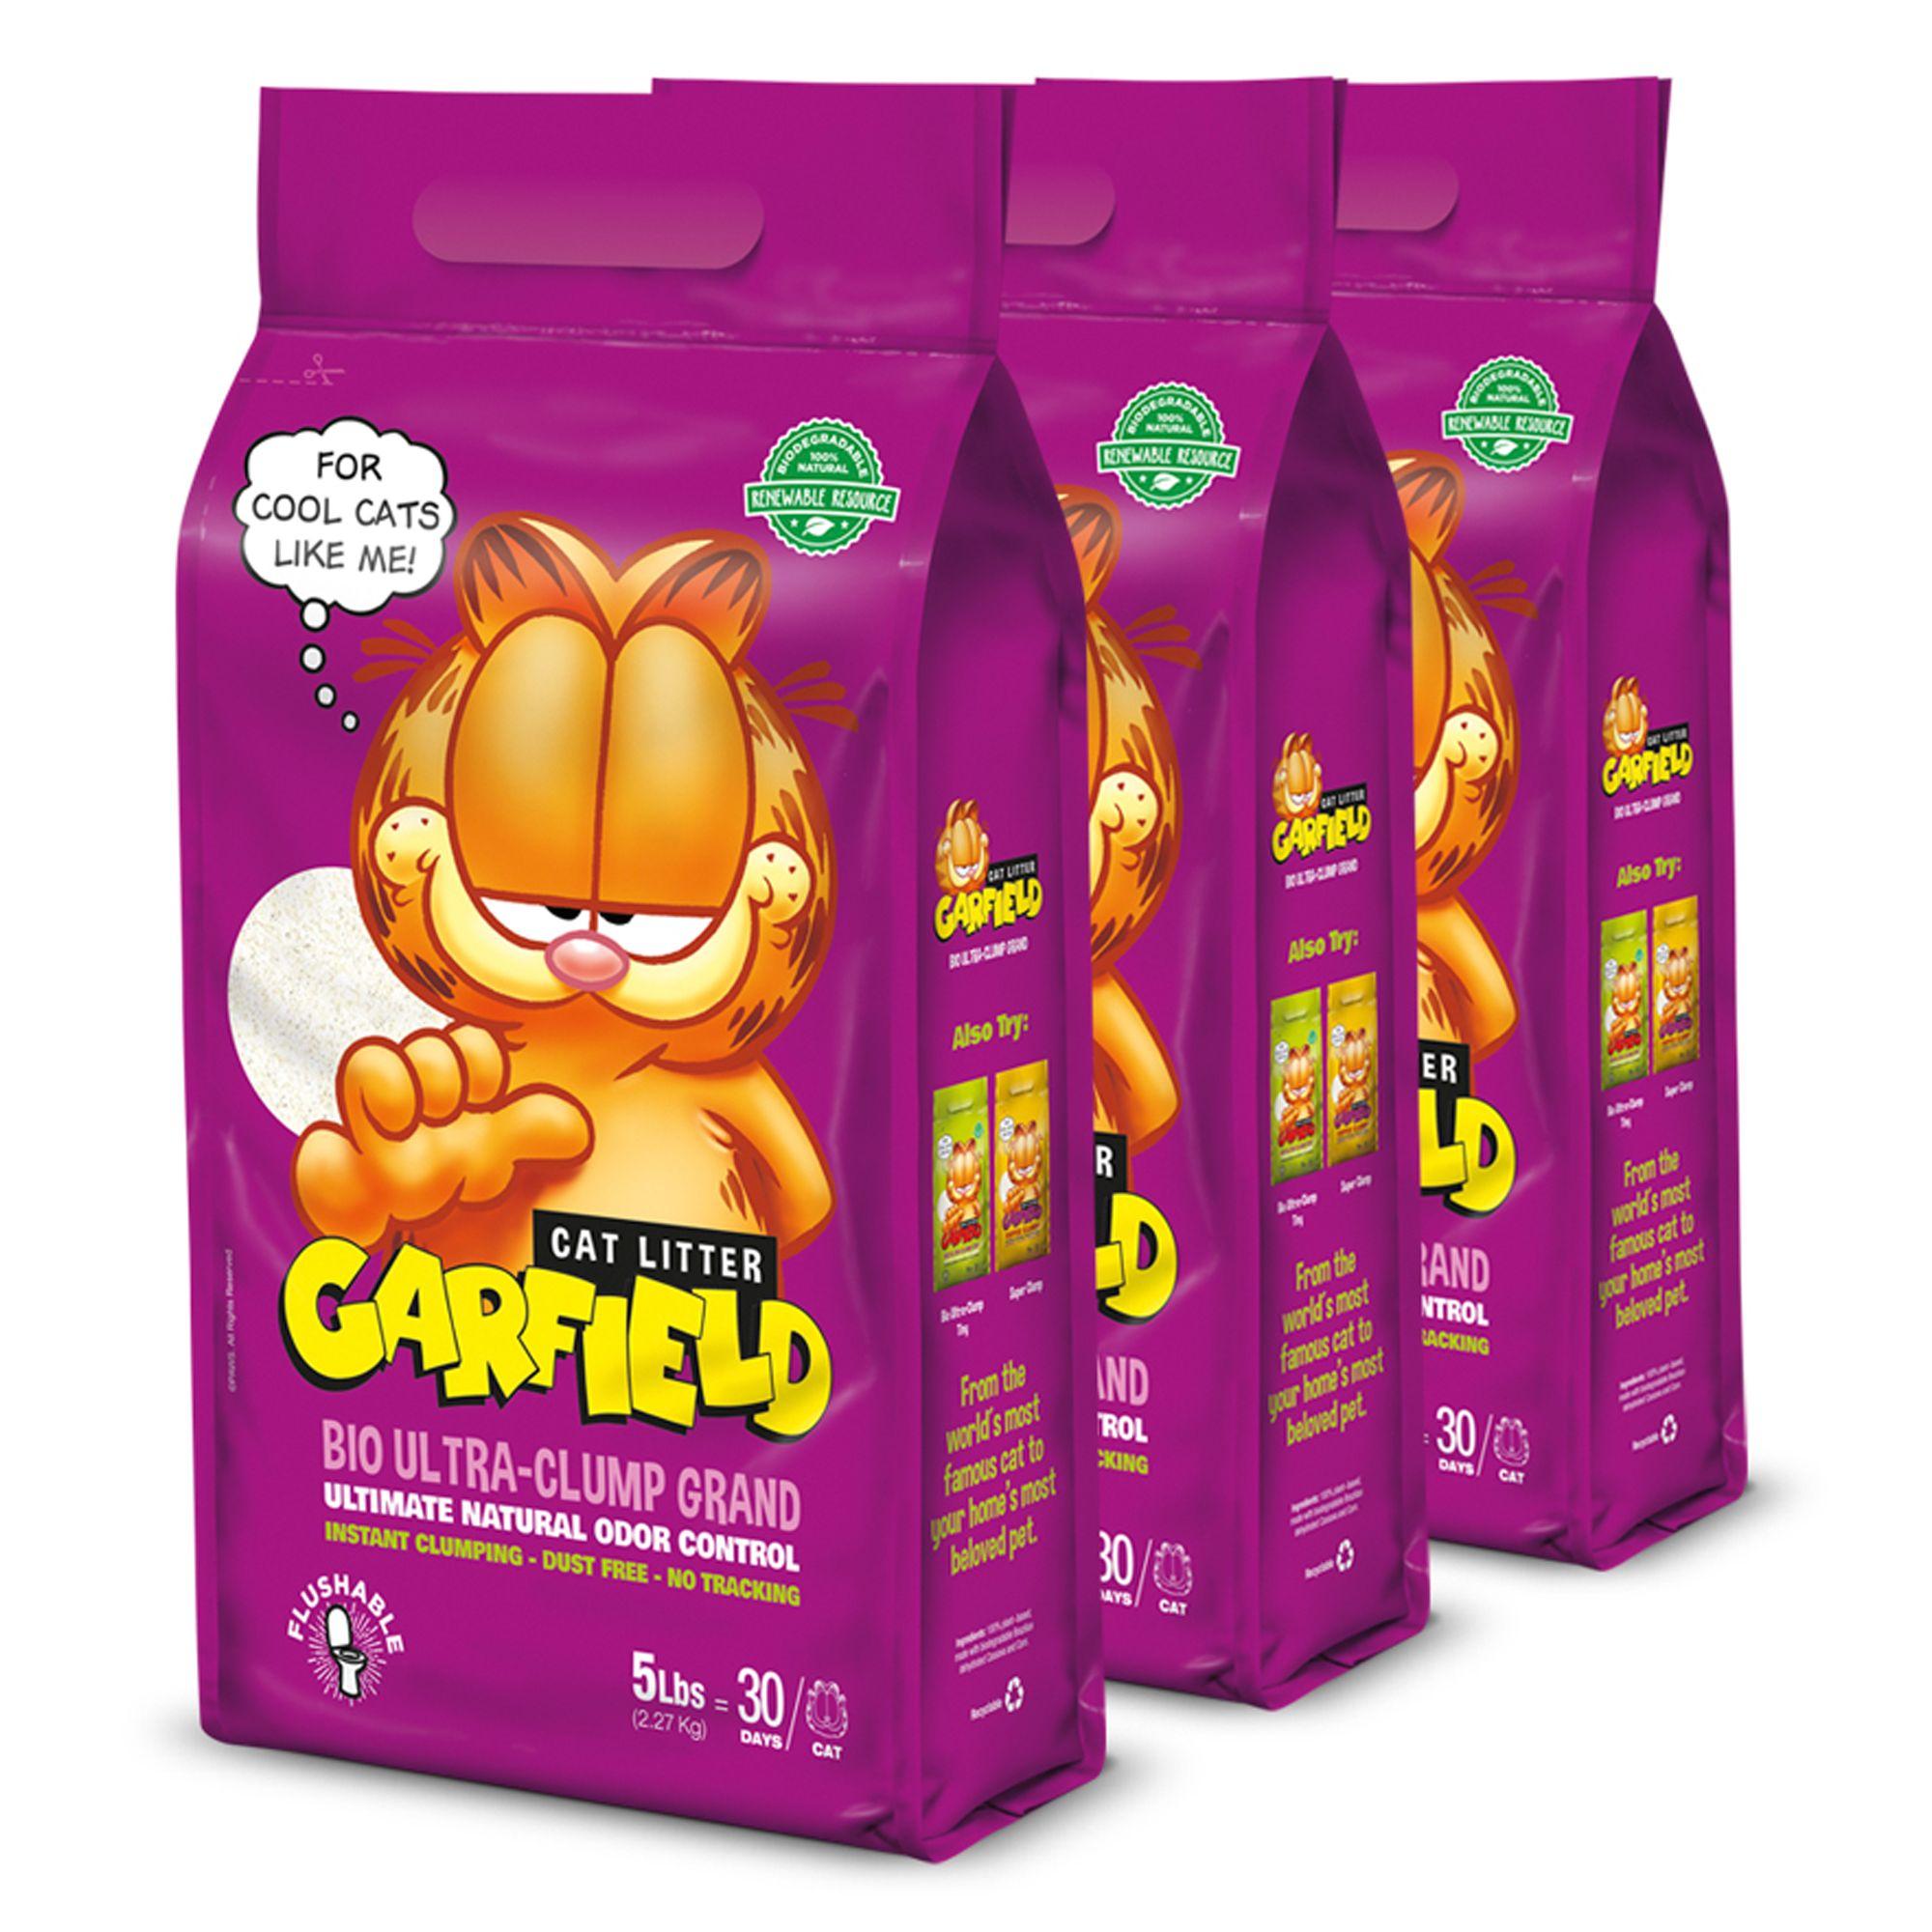 Garfield Bio Ultra Clump Grand Cat Litter Natural Clumping 3 Pack Size 15 Lb